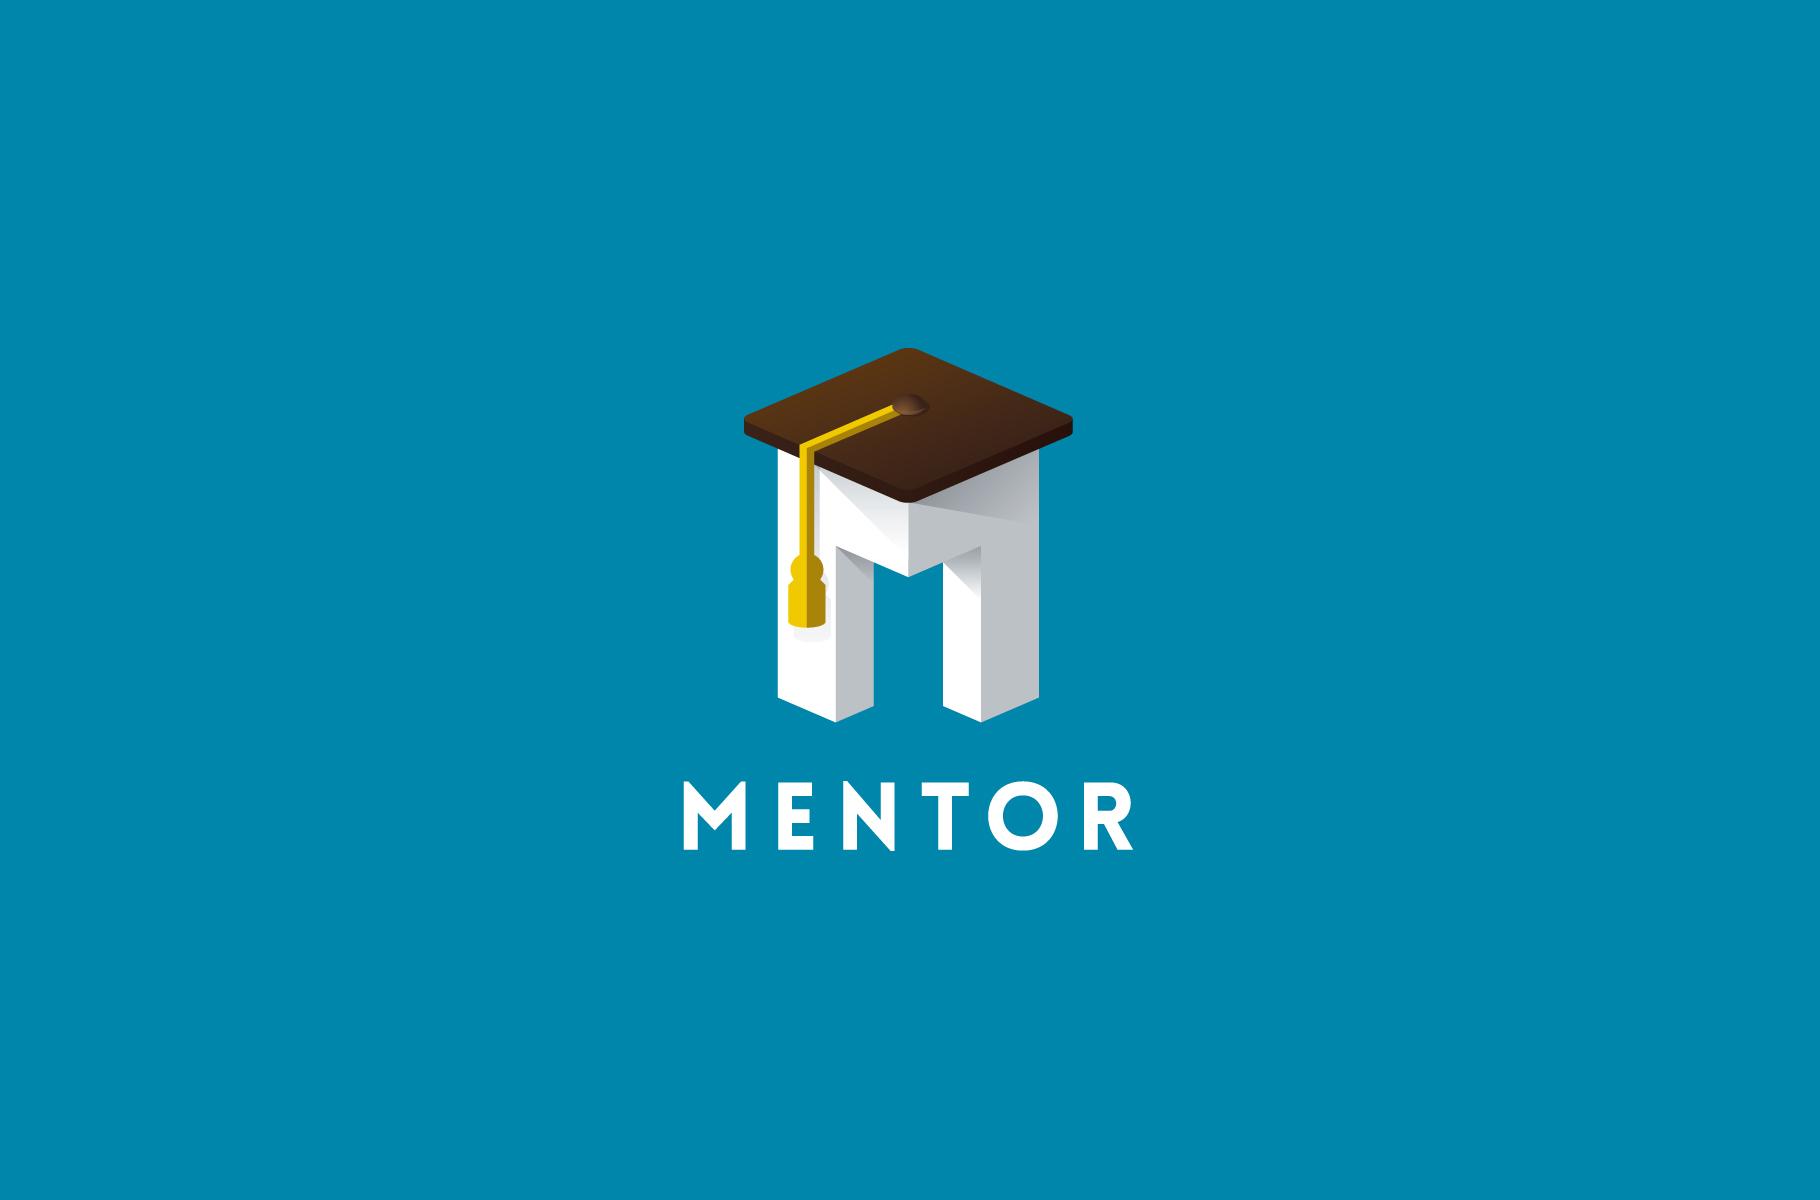 Mentor 2